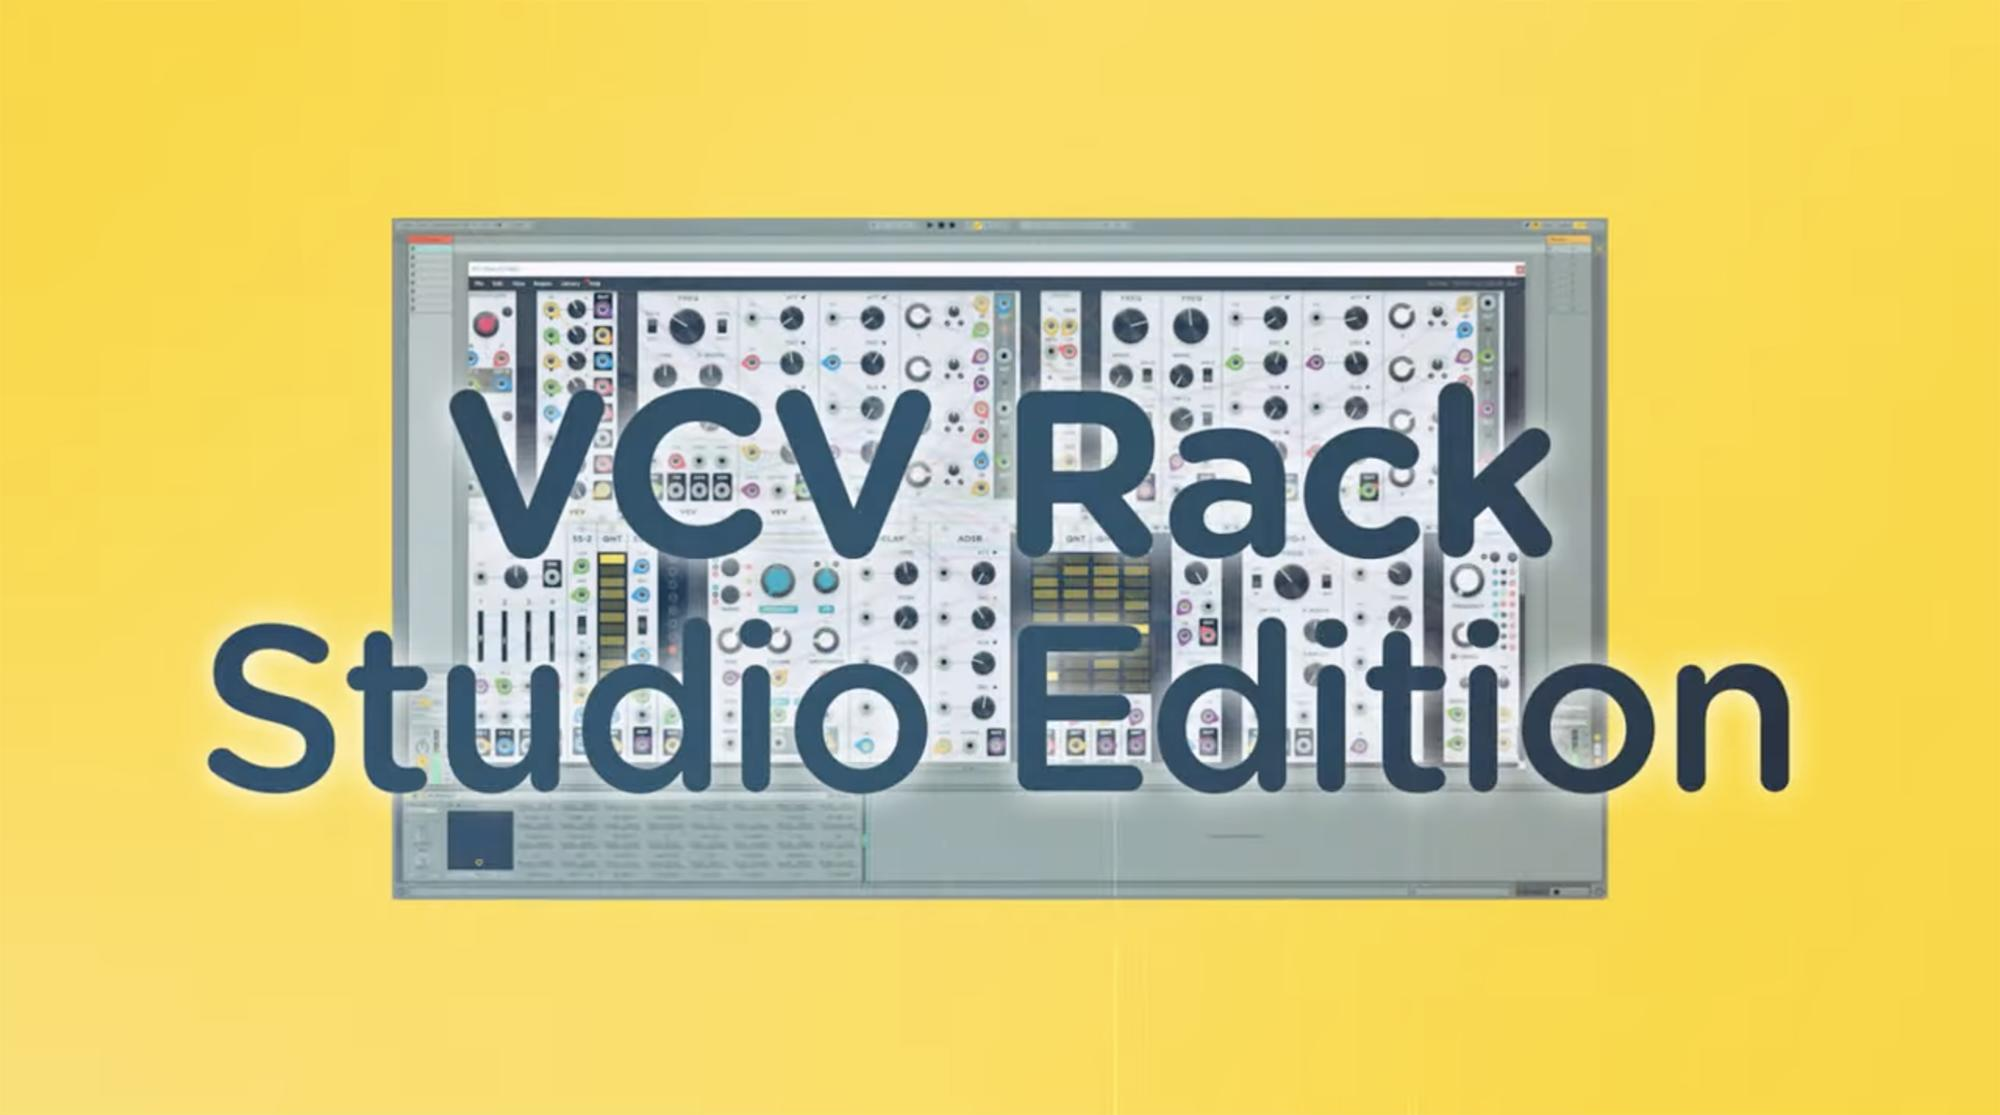 VCV Rack 2 Studio Edition